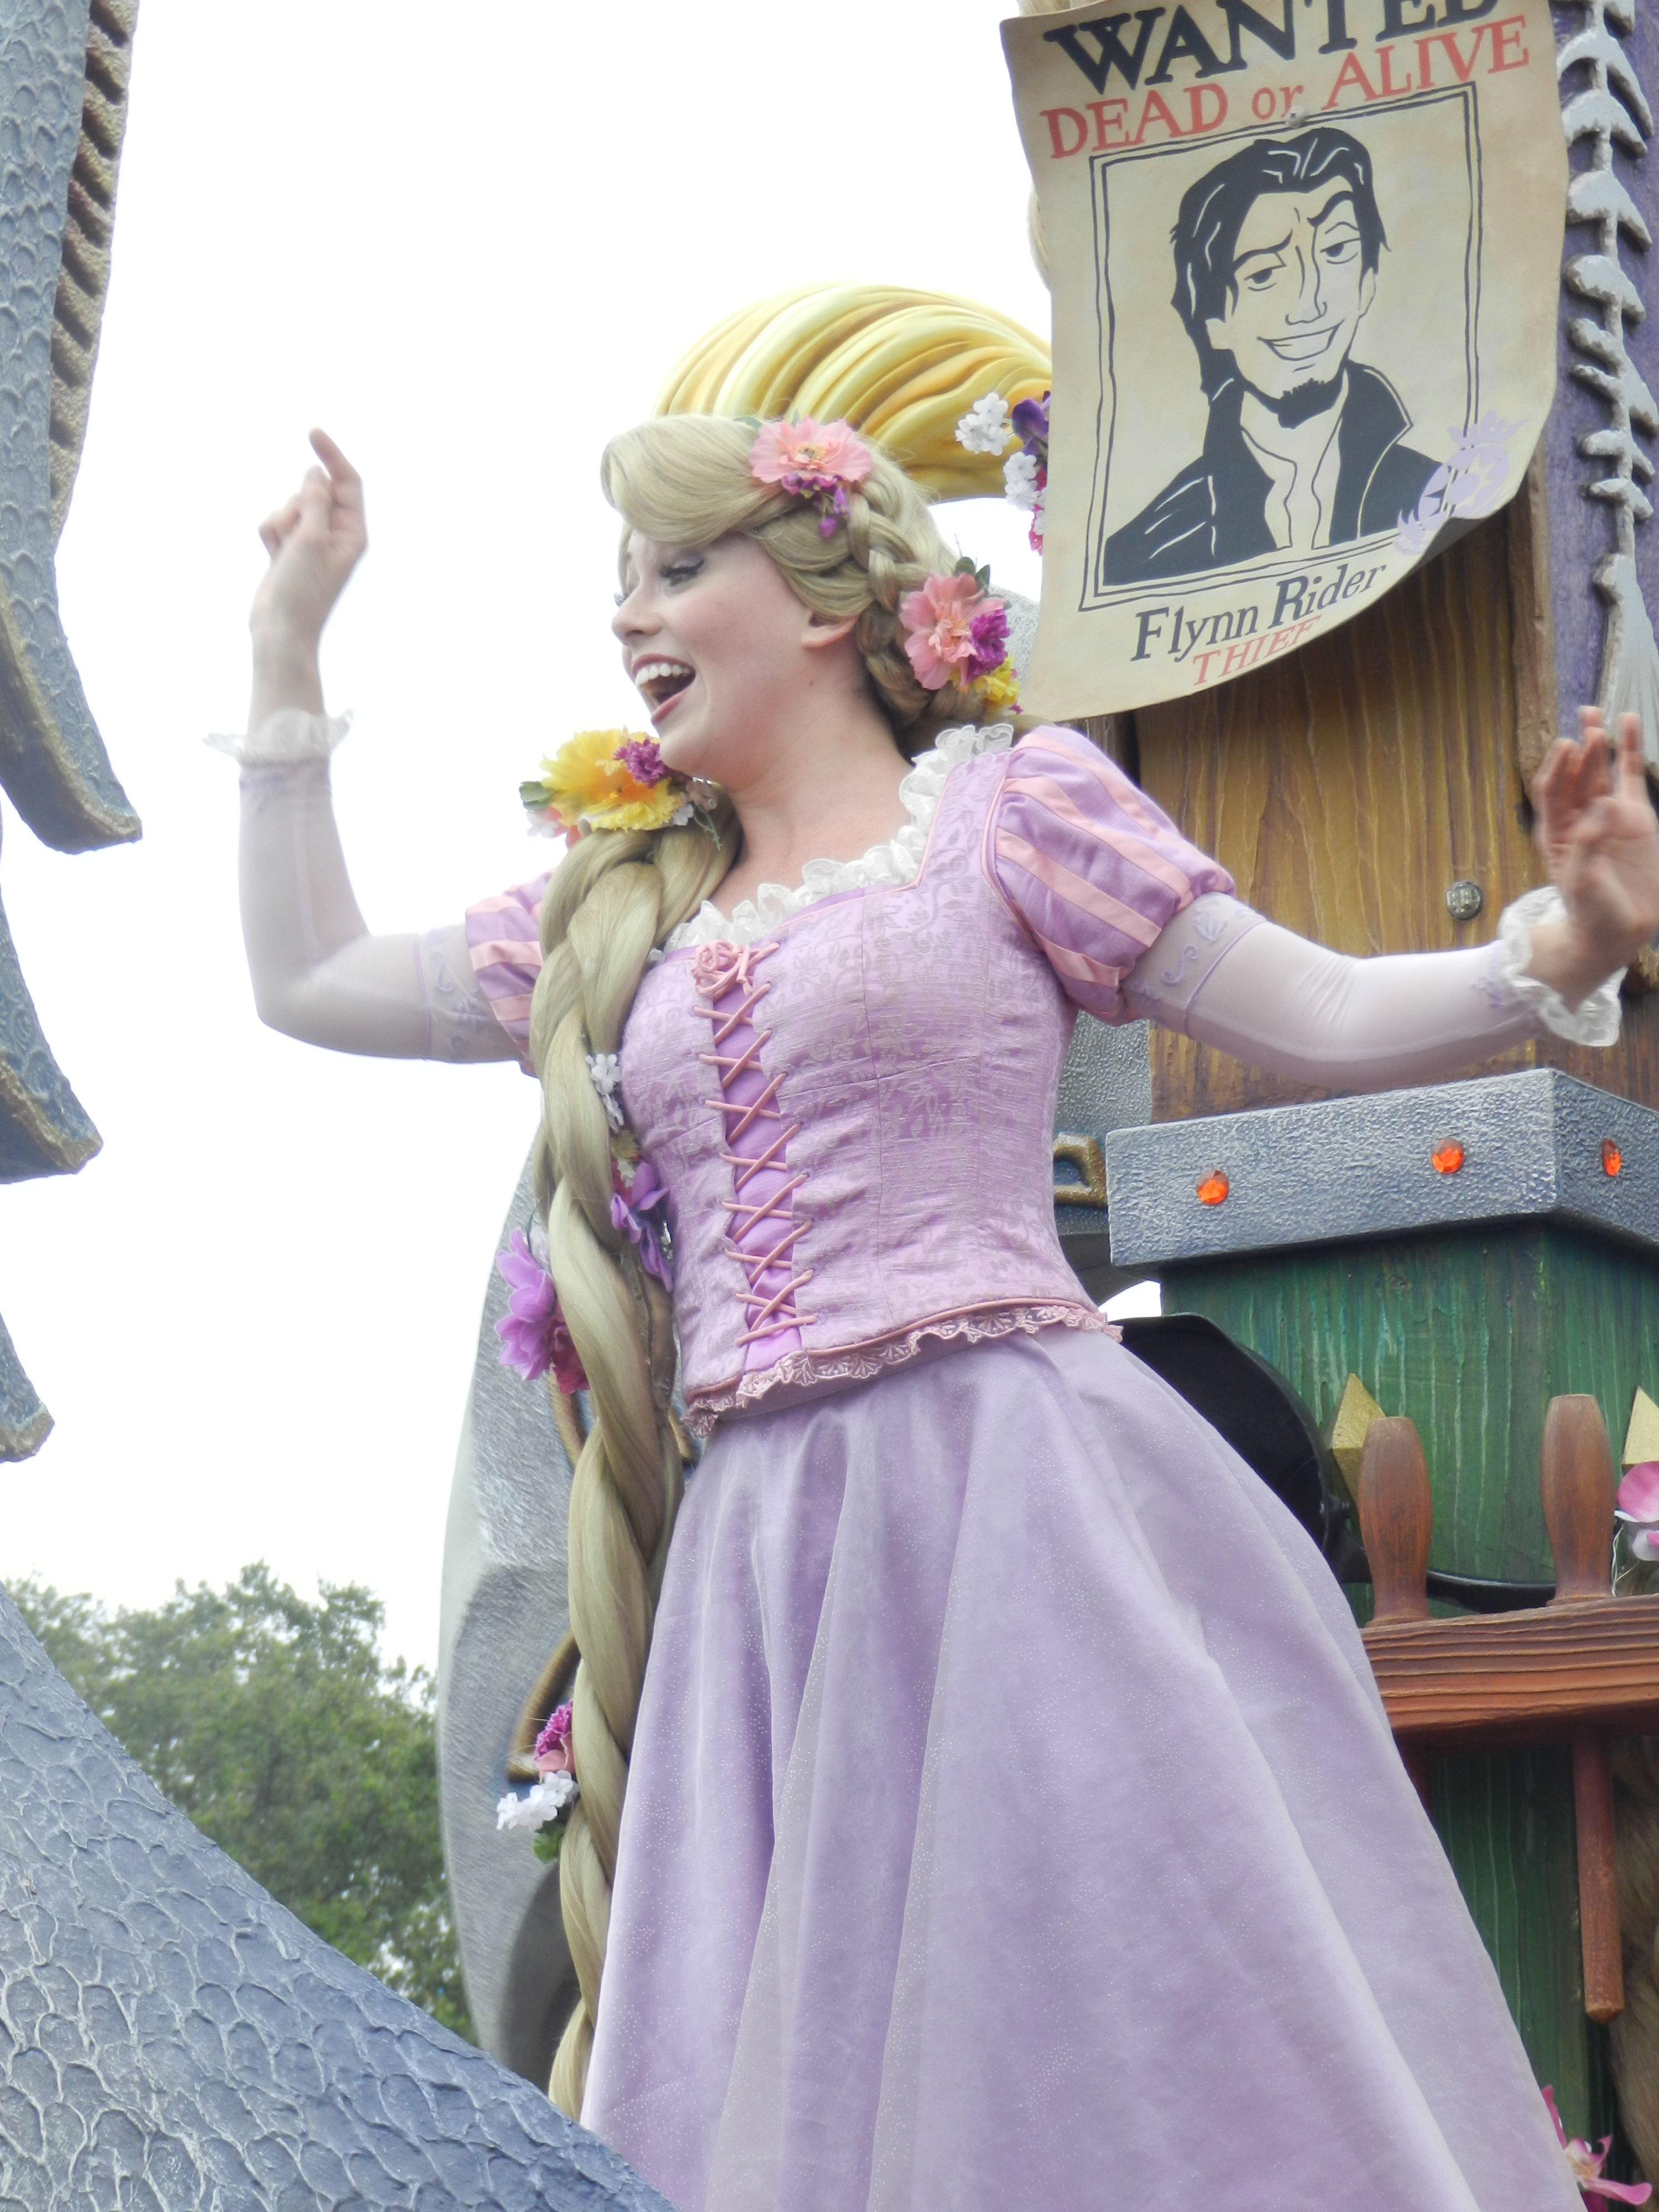 Festival of Fantasy Parade ~ May 2014 (Photo by Karleigh Mastrianna)